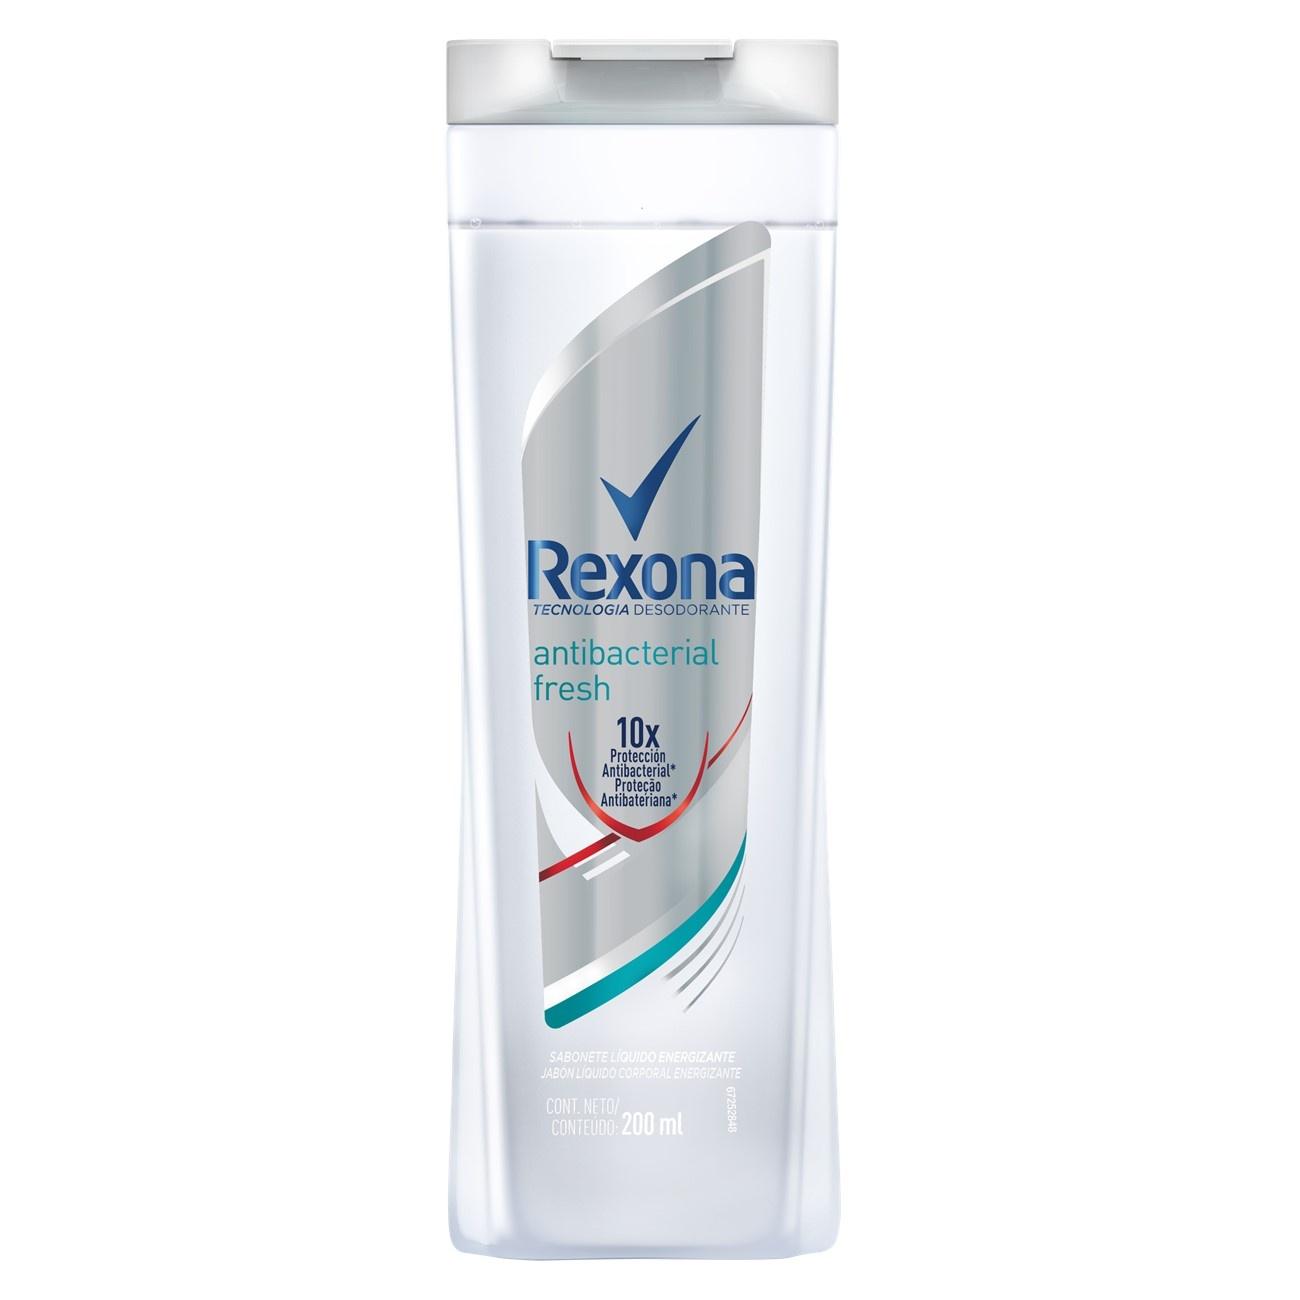 Sabonete Líquido REXONA Antibacterial Fresh 200 ML